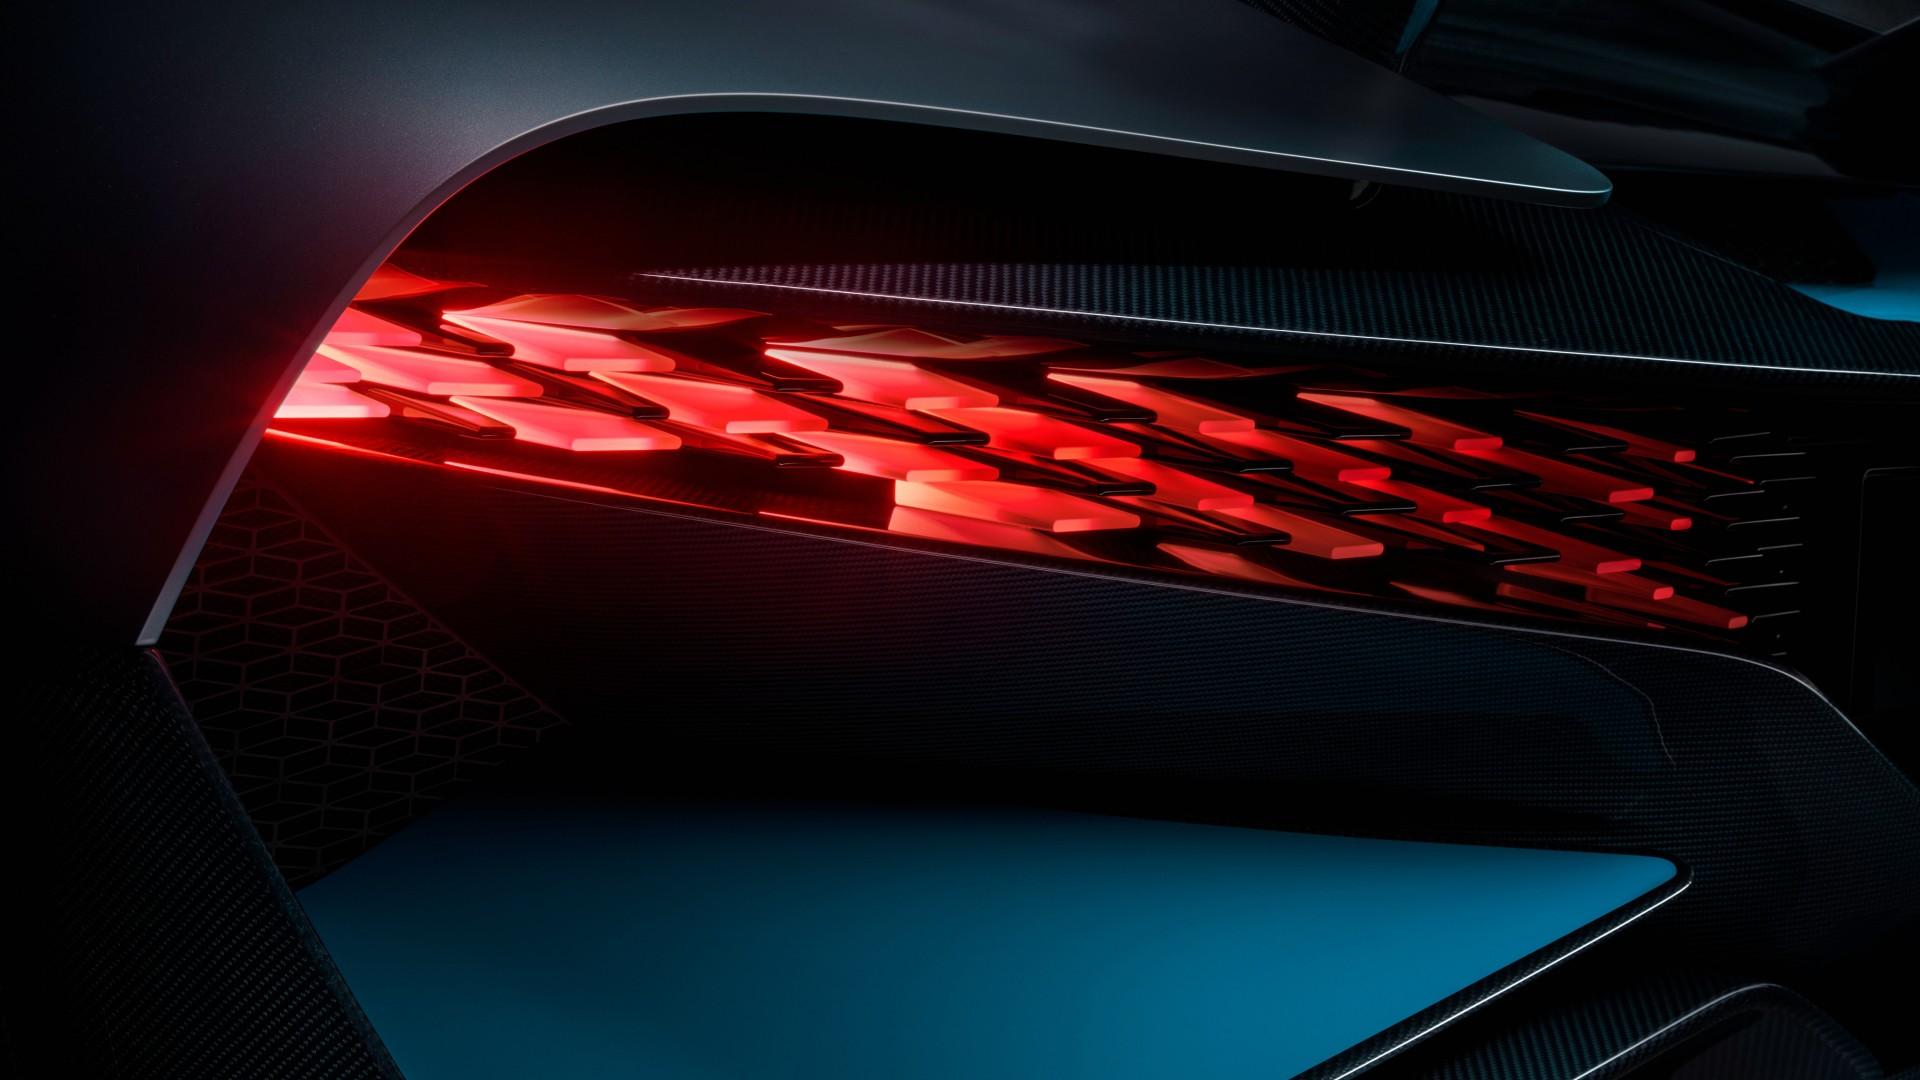 2019 Bugatti Divo Led Tail Lights 4k Wallpaper Hd Car